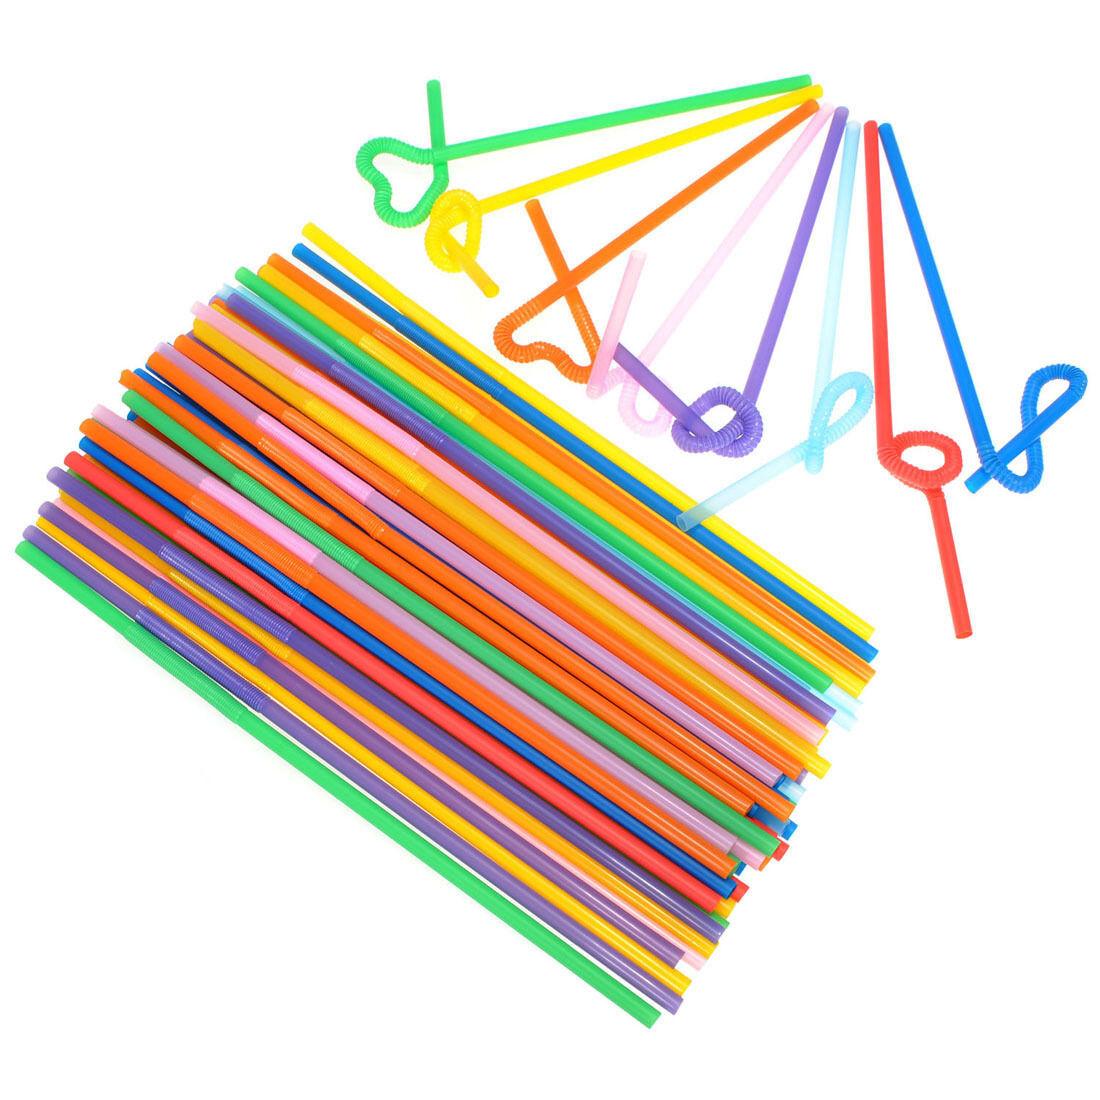 100PCS Super Extra Bendy Long Mega Drinking Straws 10.23 Coloured Party Gift